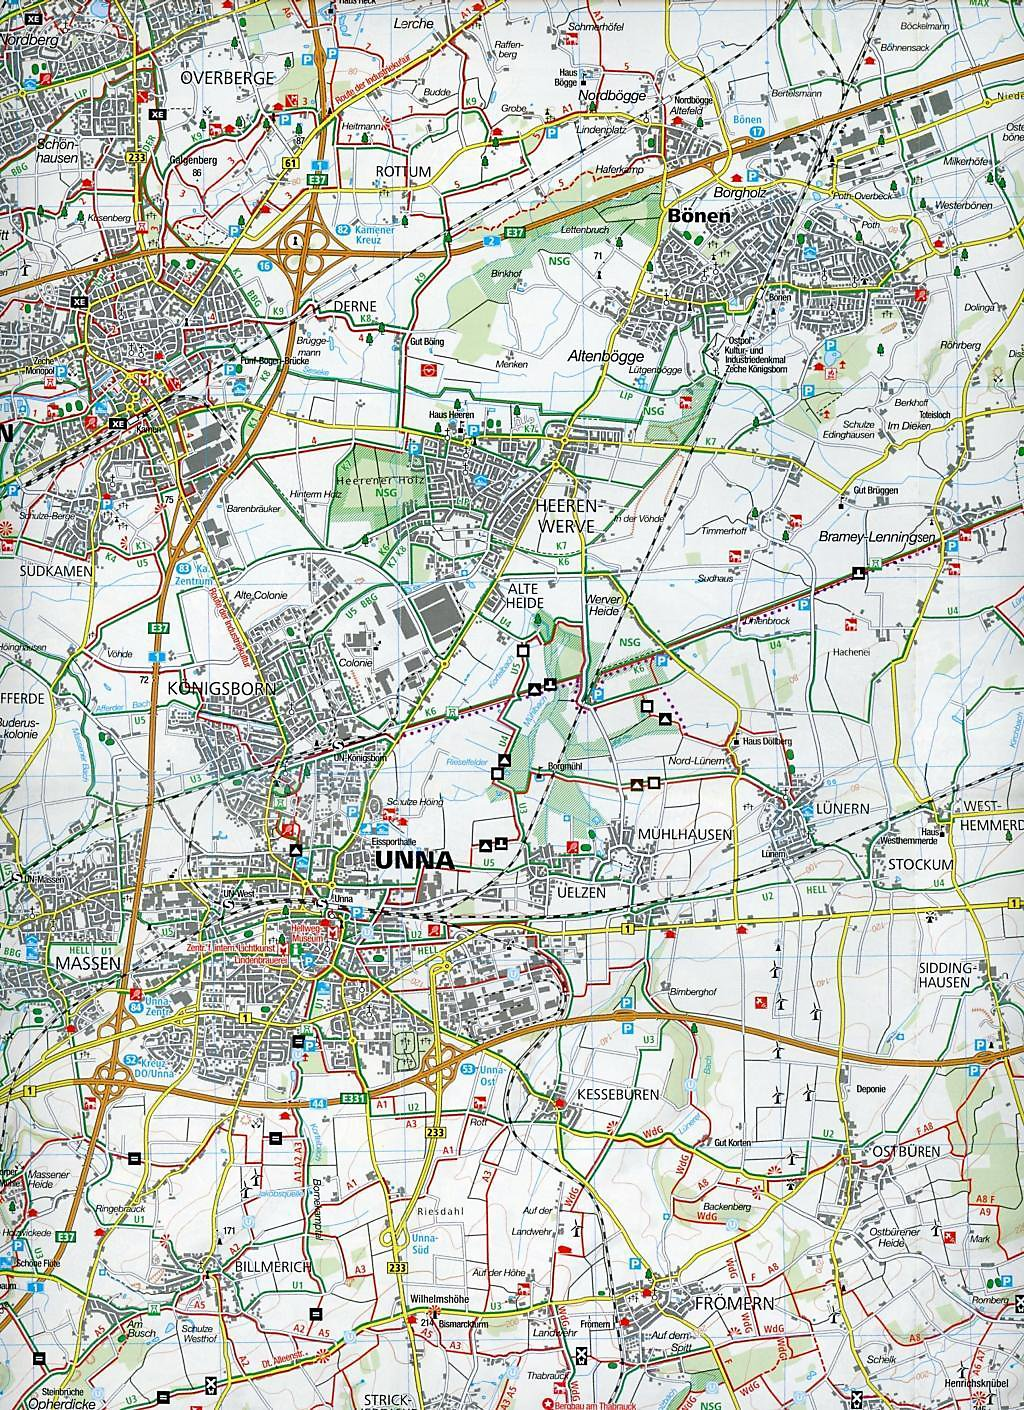 Karte Ruhrgebiet.Kompass Karte Ruhrgebiet 3 Bl Buch Portofrei Bei Weltbild De